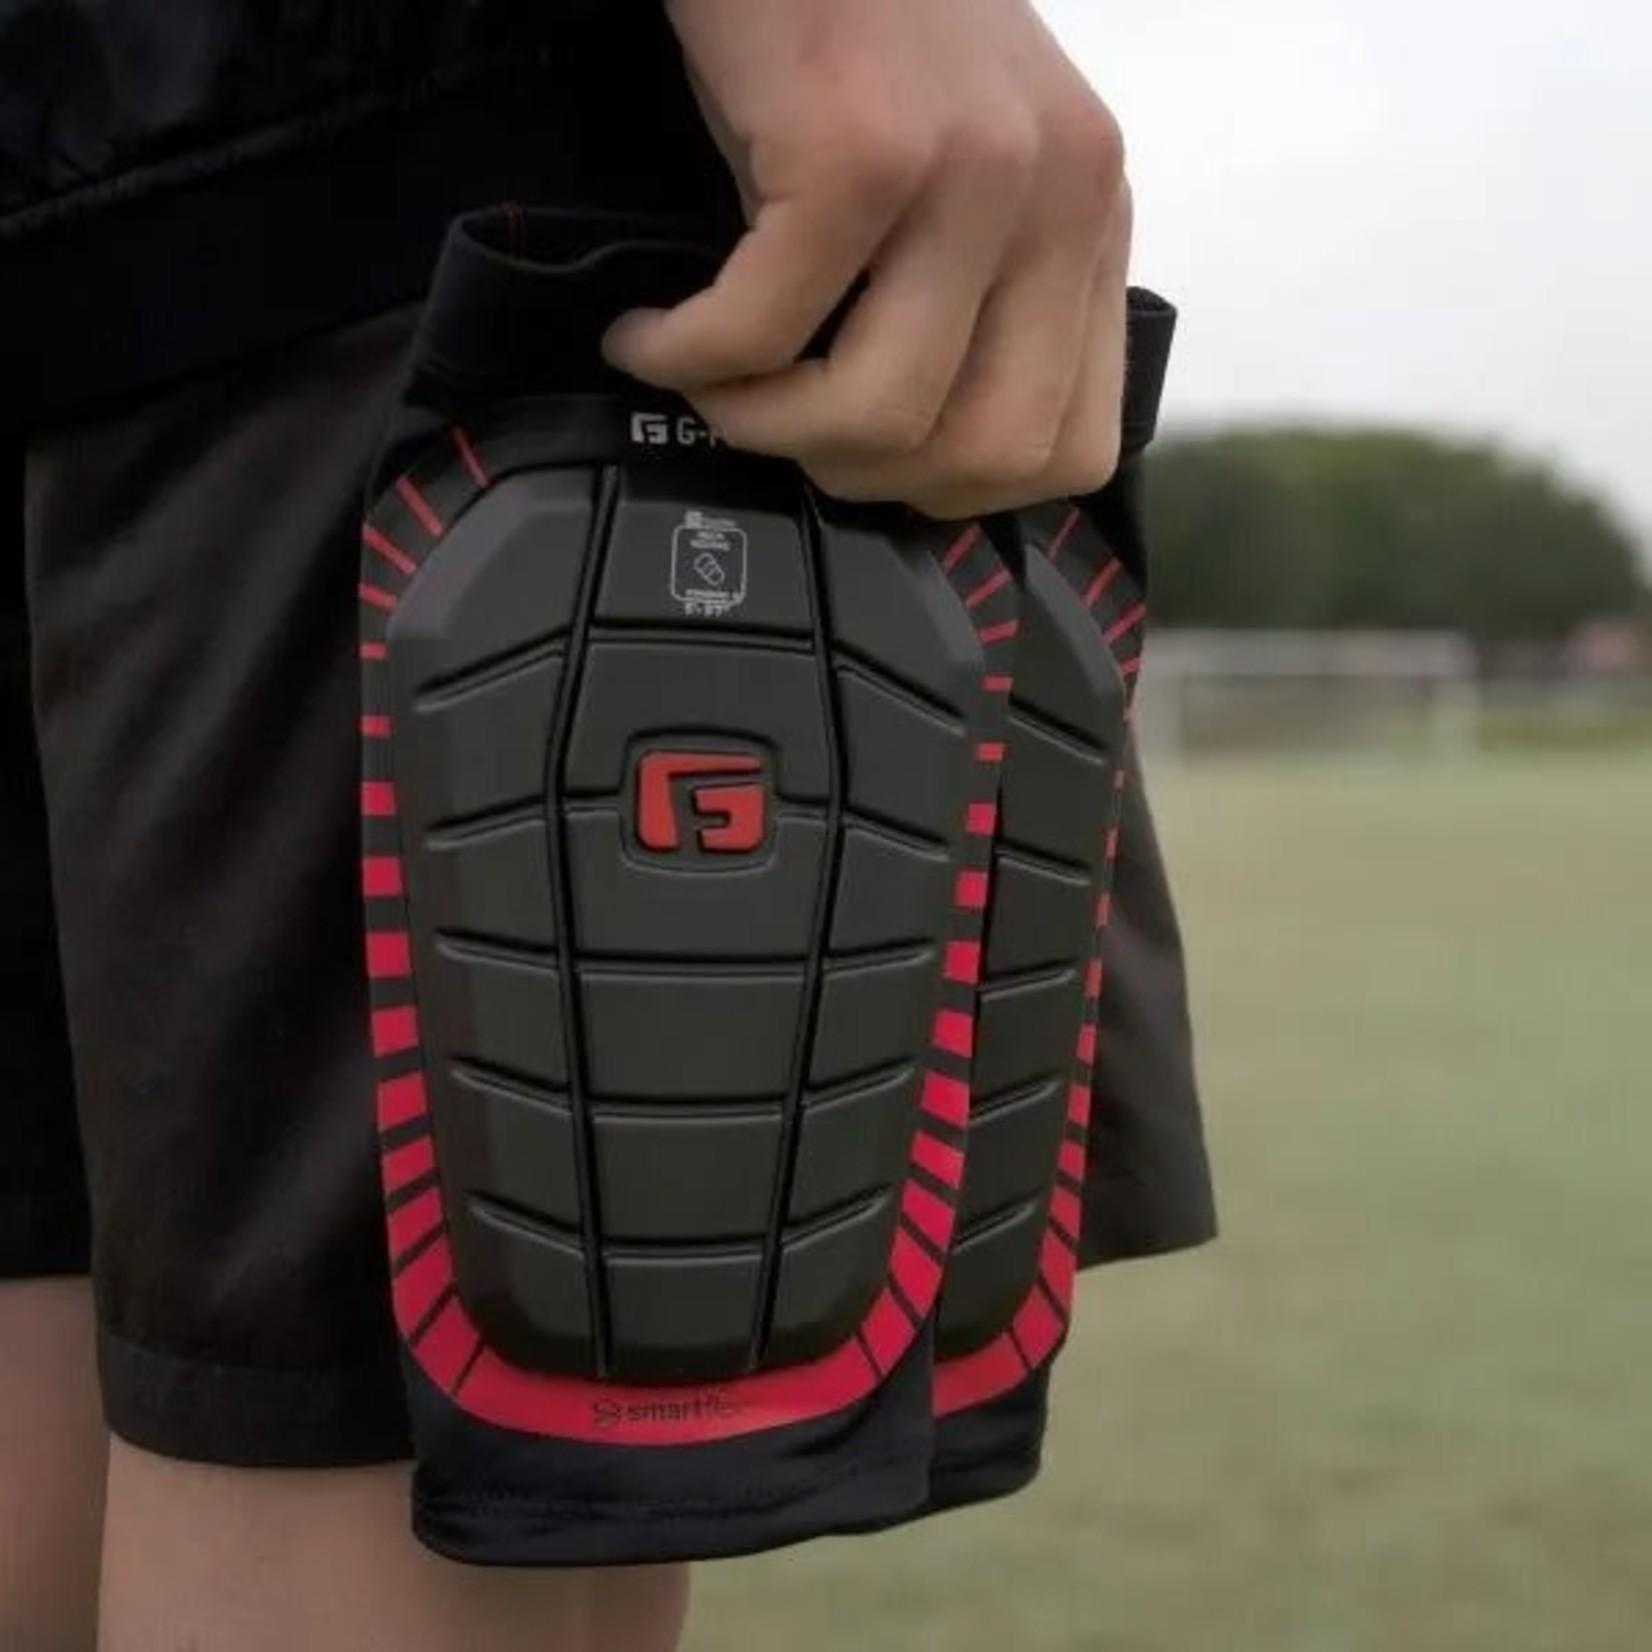 G-FORM PRO-S PREMIER SHIN GUARD (BLACK/RED)